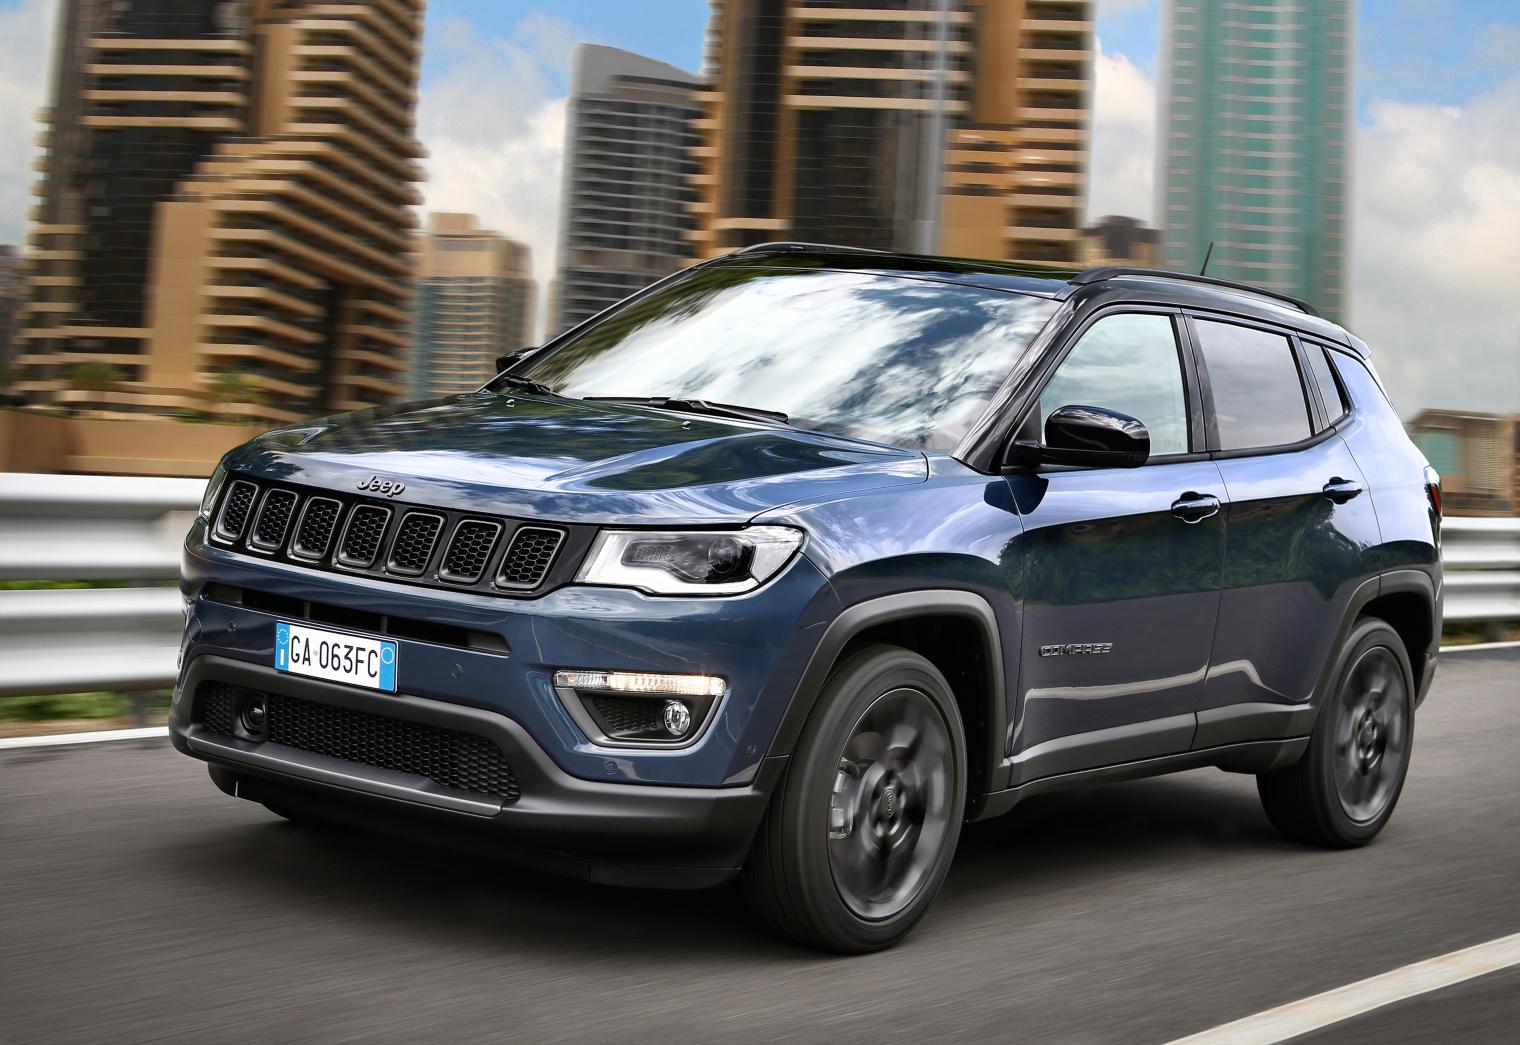 Esterni nuova Jeep Compass 2020